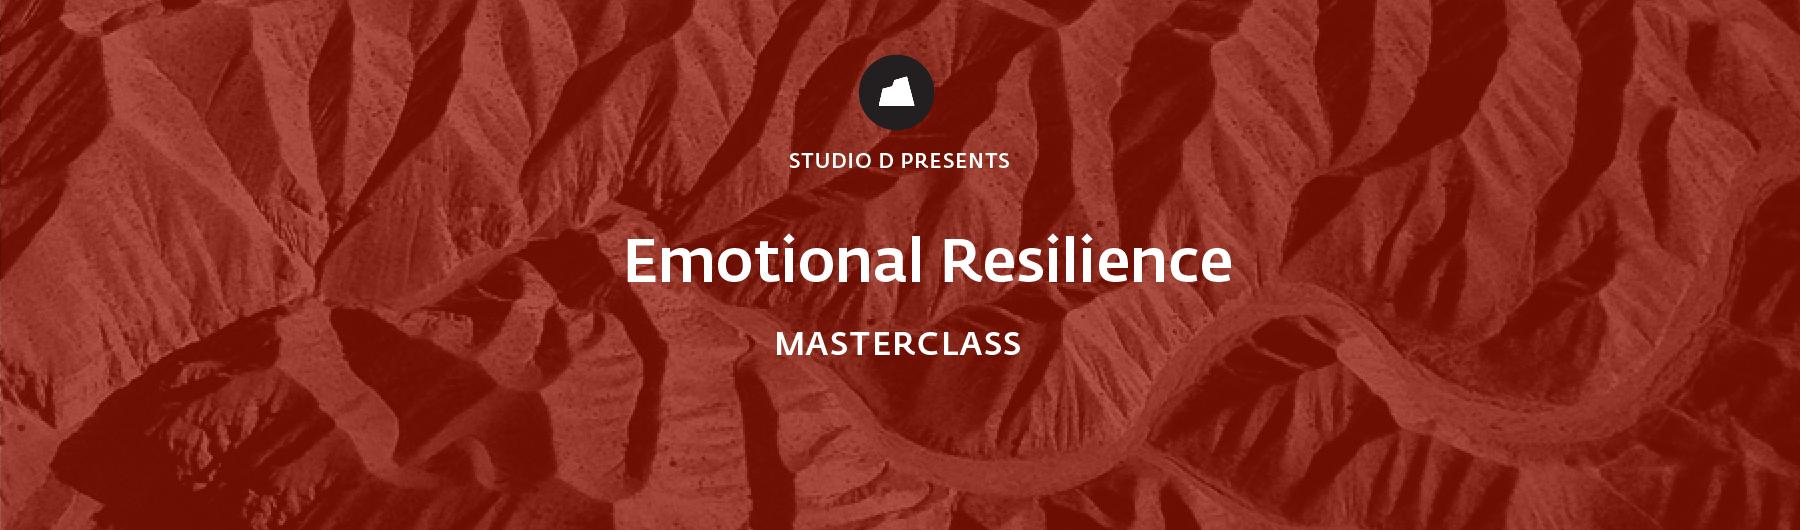 Emotional Resilience Masterclass, 25 September 2020, London